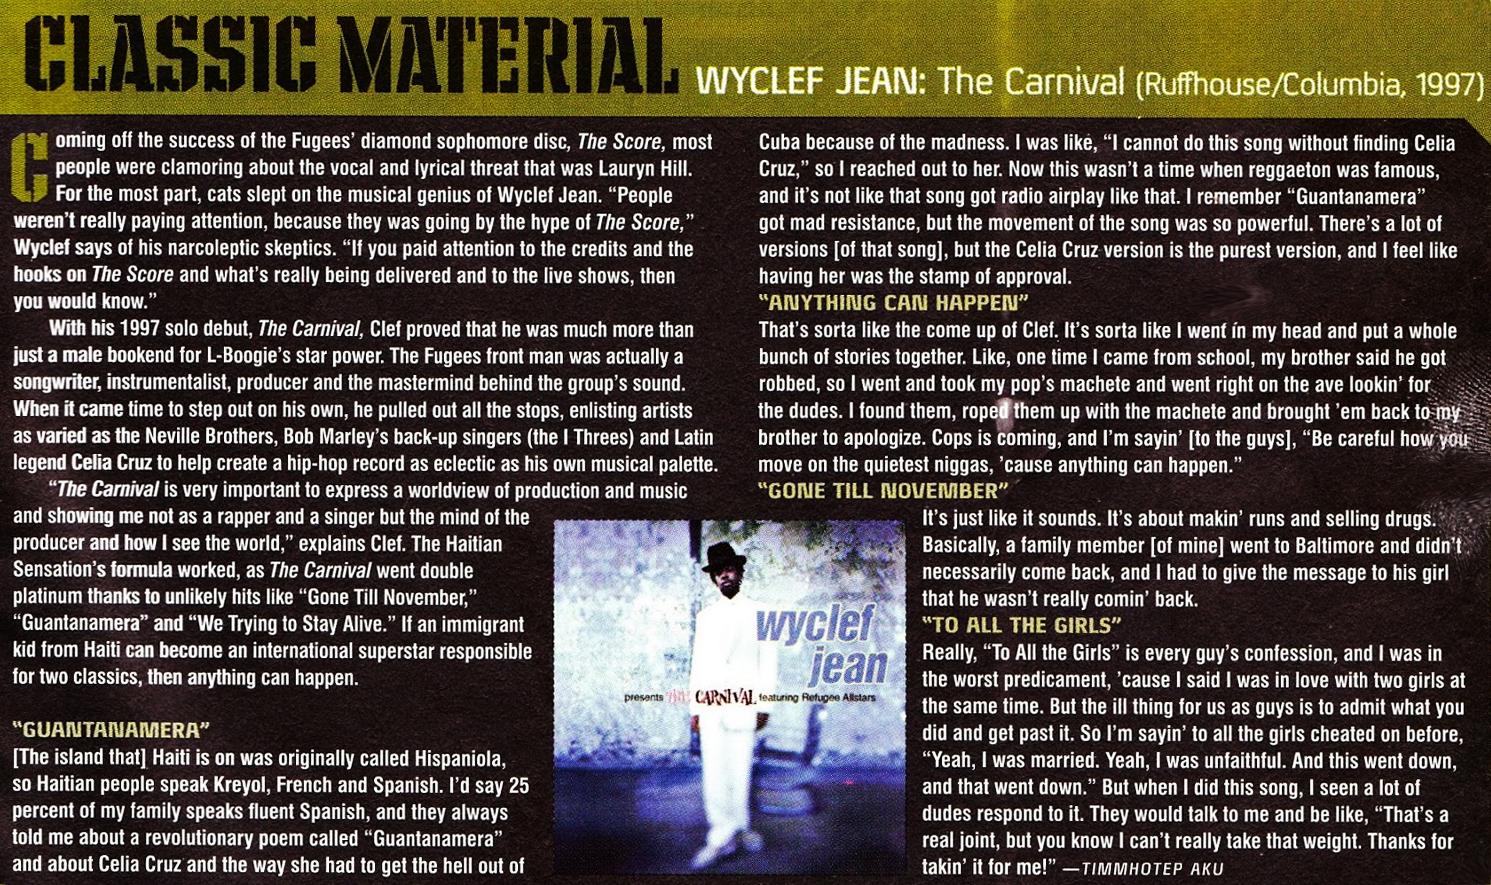 Hip-Hop Nostalgia: Wyclef Jean